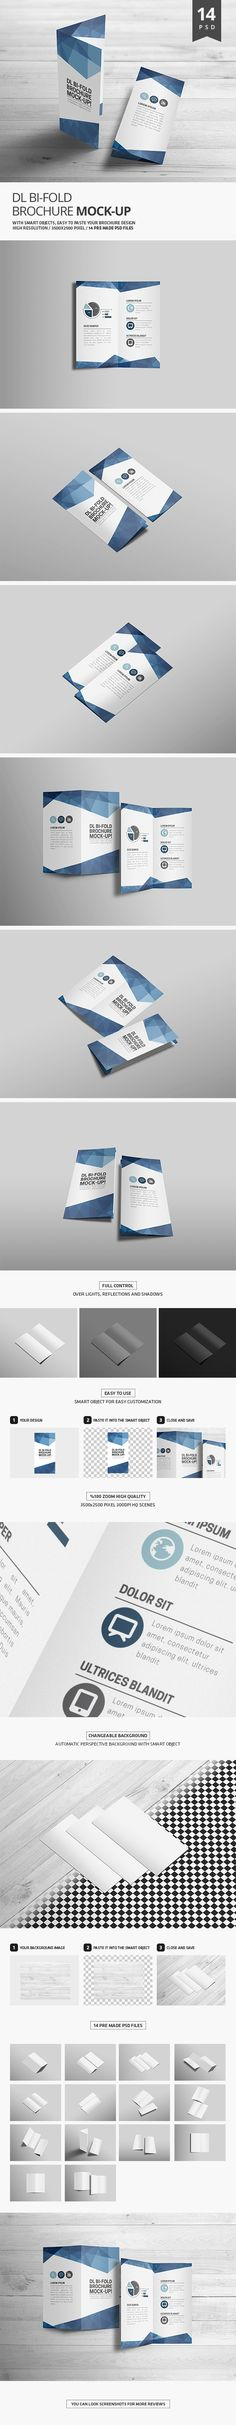 "Check out this @Behance project: ""DL Bi-Fold Brochure Mock-Up"" https://www.behance.net/gallery/46184679/DL-Bi-Fold-Brochure-Mock-Up"